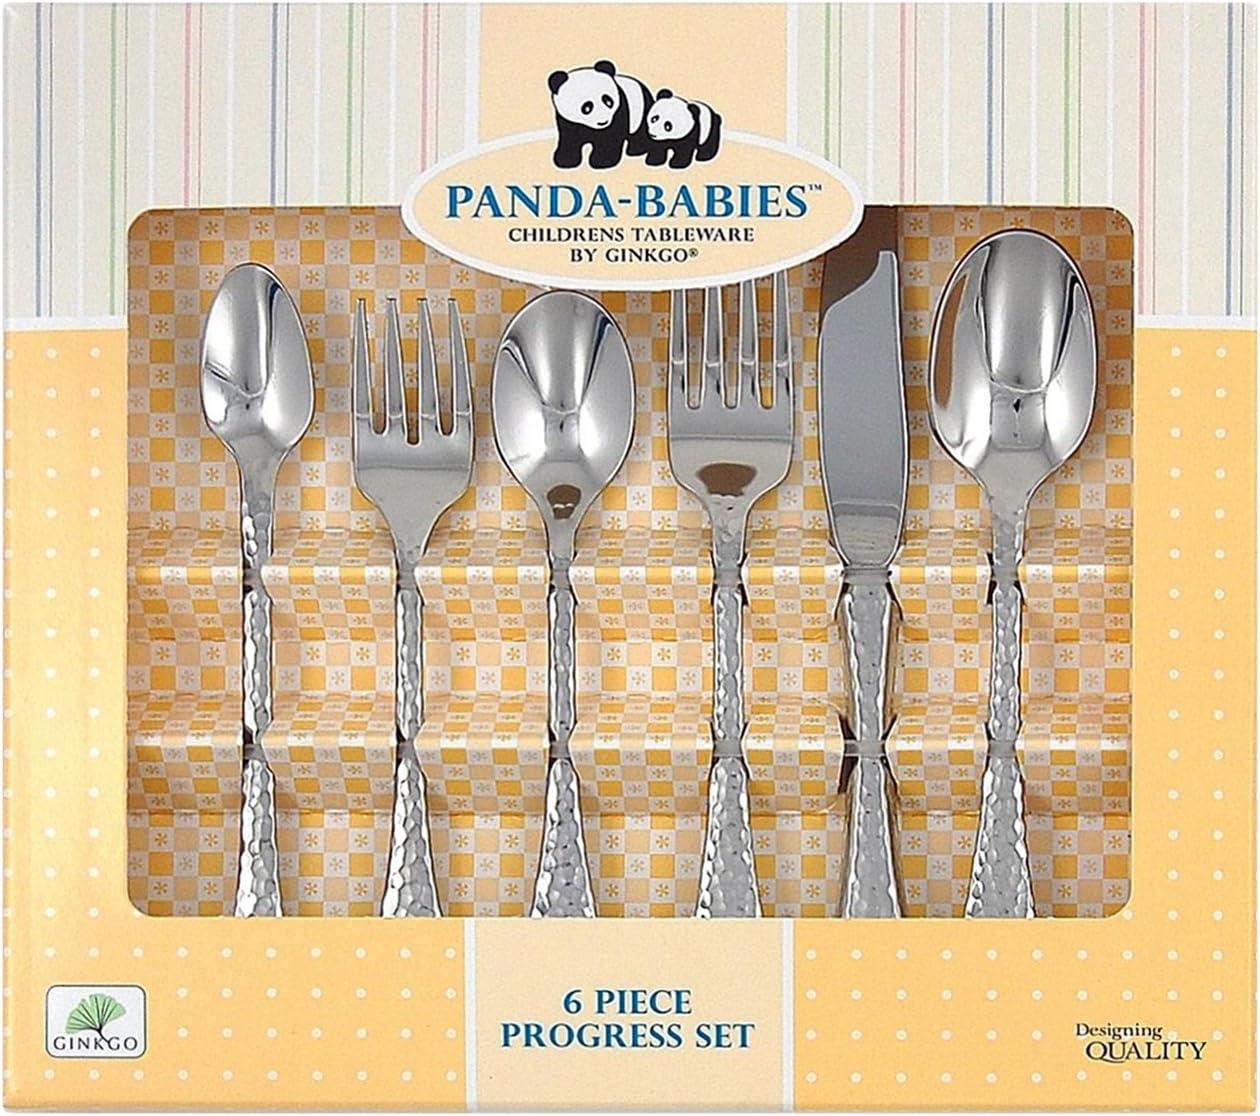 Ginkgo International Panda-Babies Baby to Child Progress Stainless Steel Flatware Set, 6-Piece